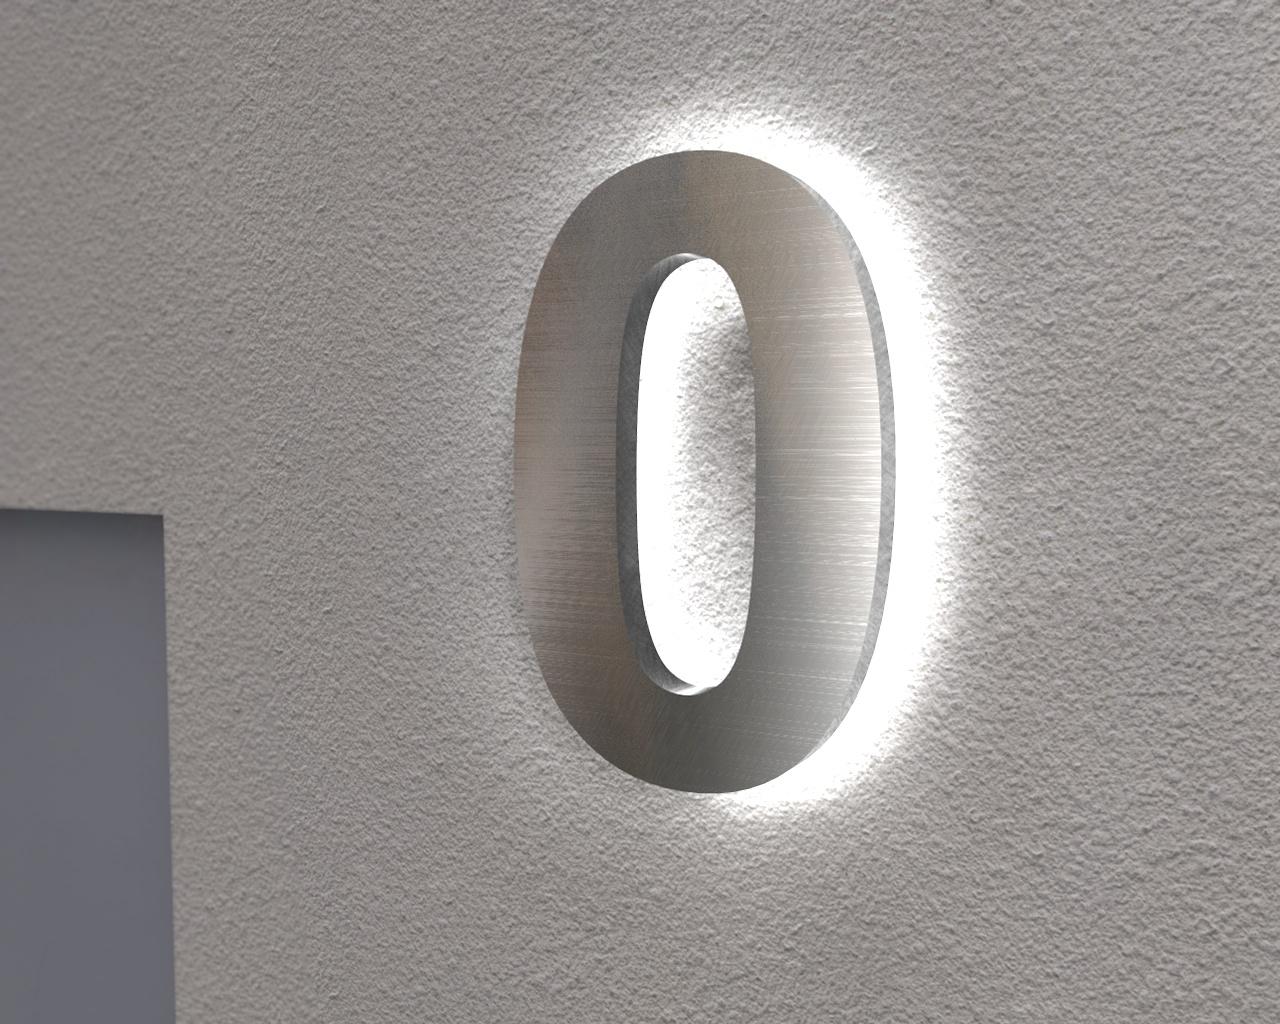 Beleuchtete Hausnummer 0 Ambilight